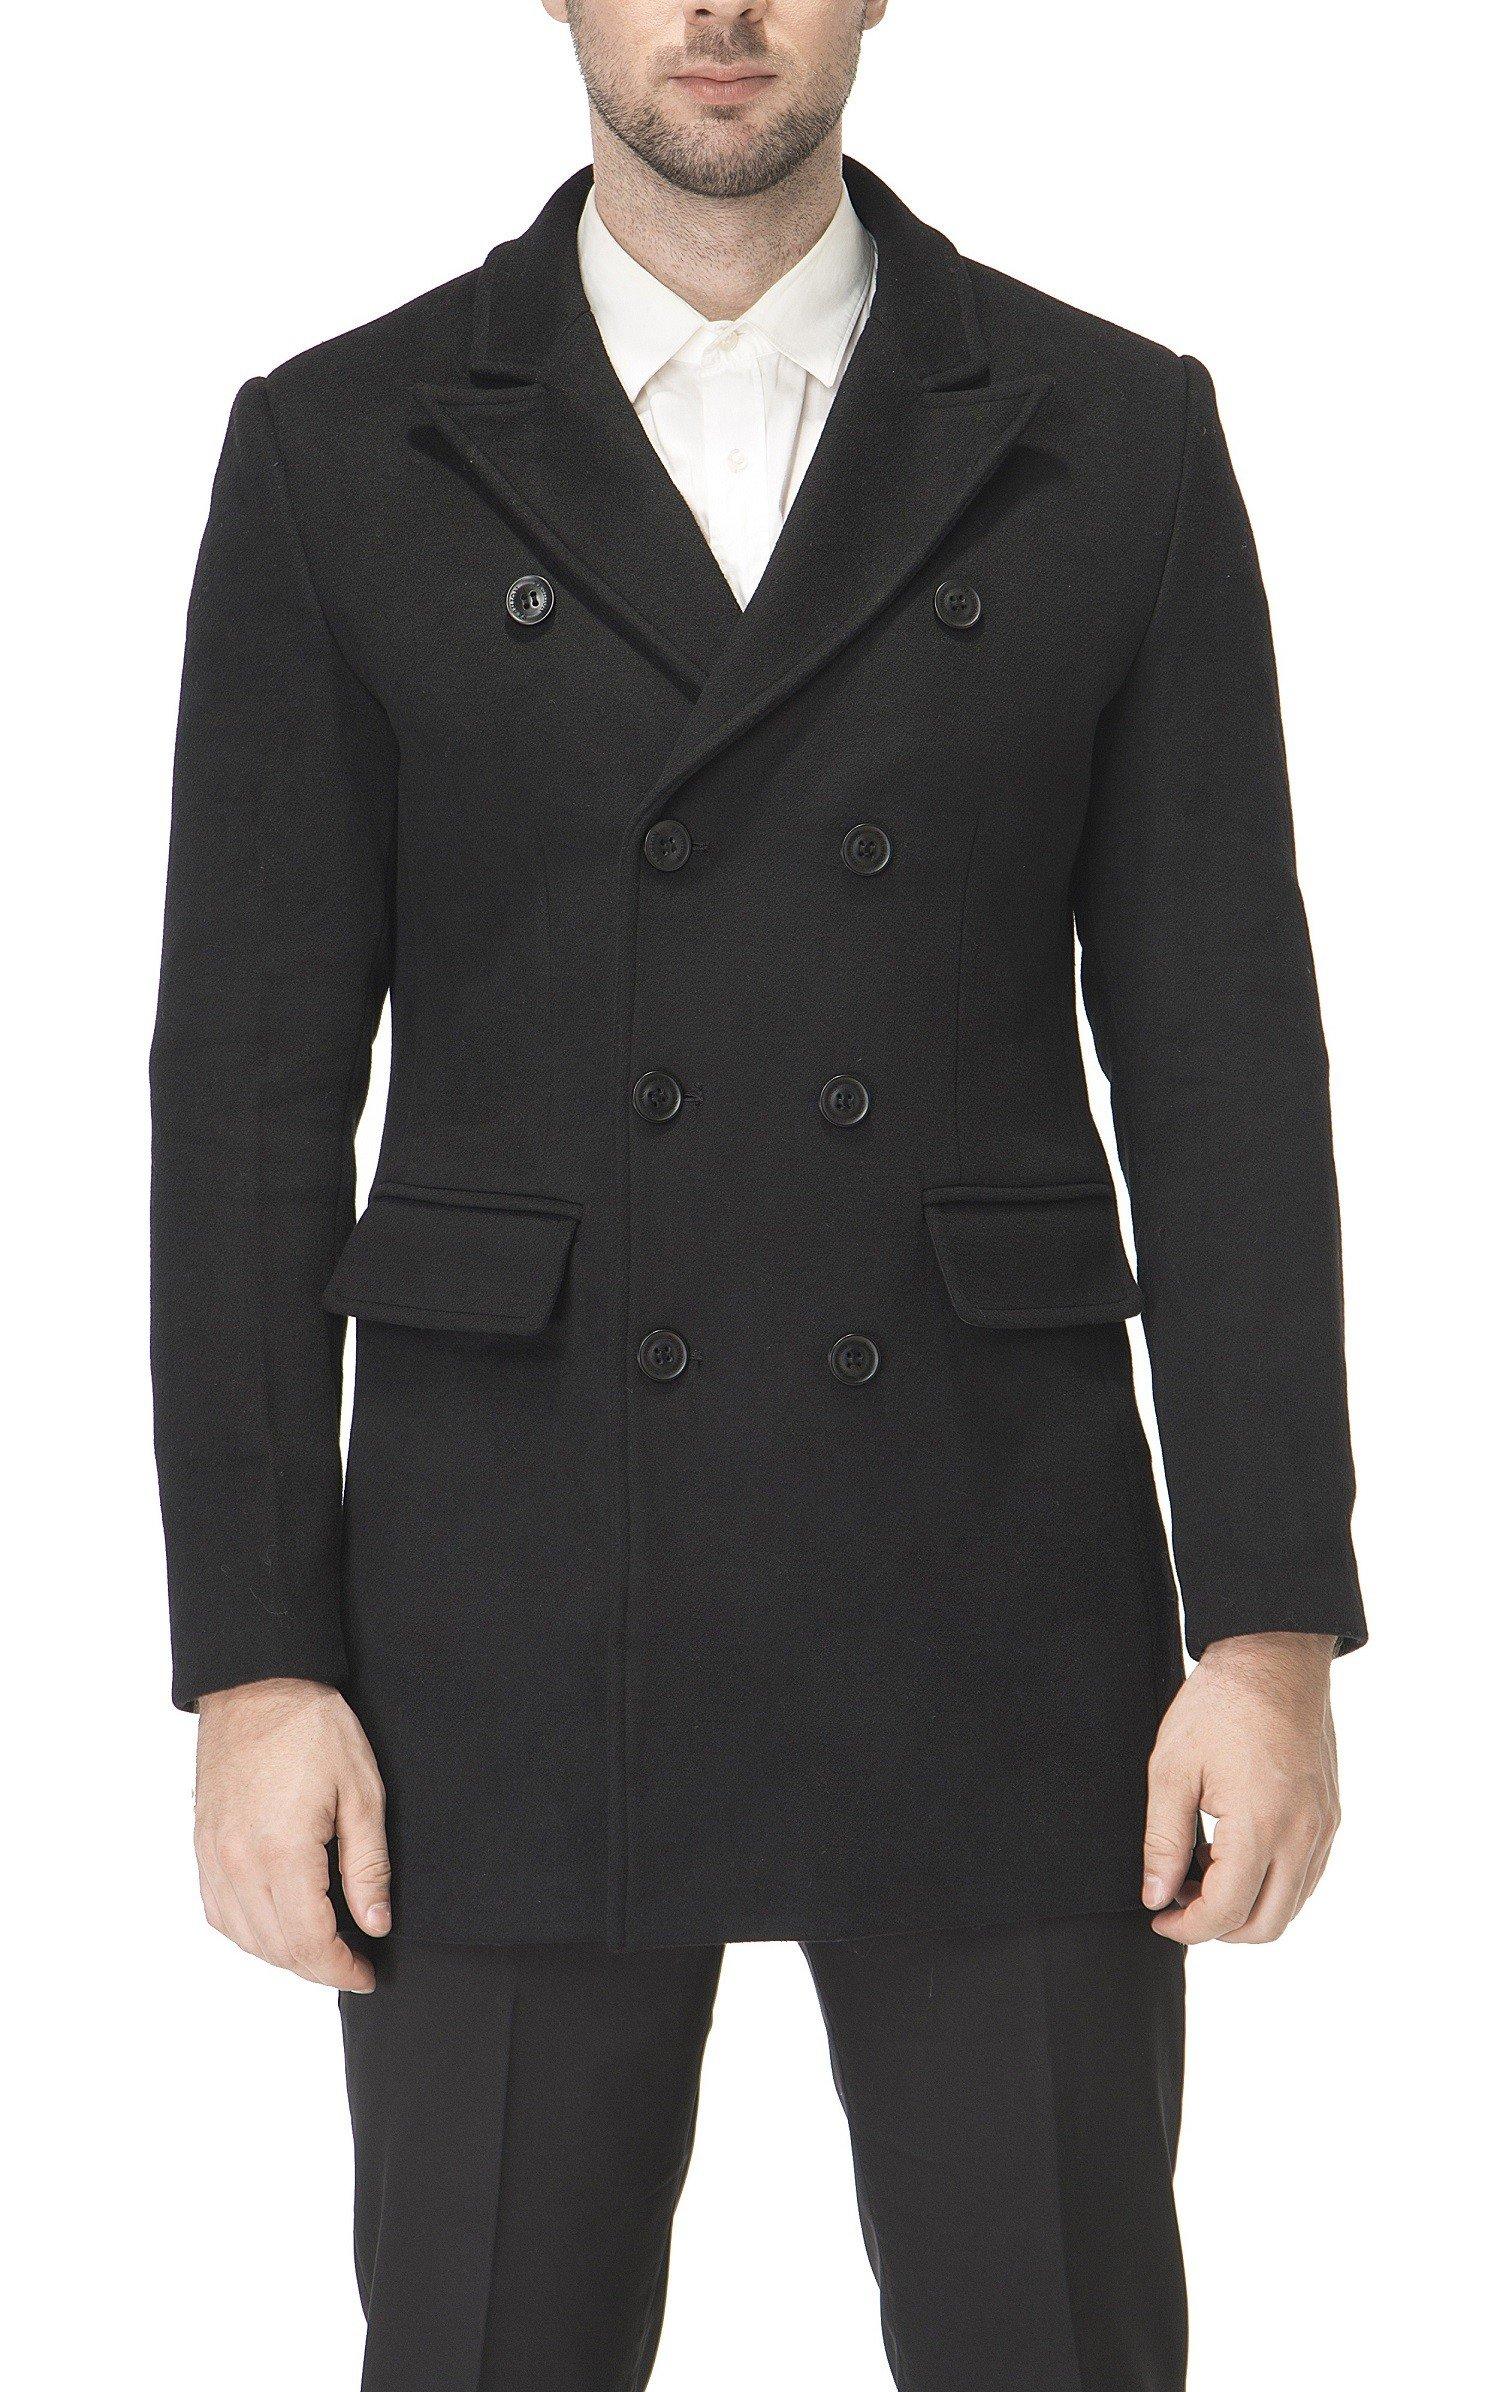 Men's Premium Wool Blend Double Breasted Long Pea Coat (Black, Medium)